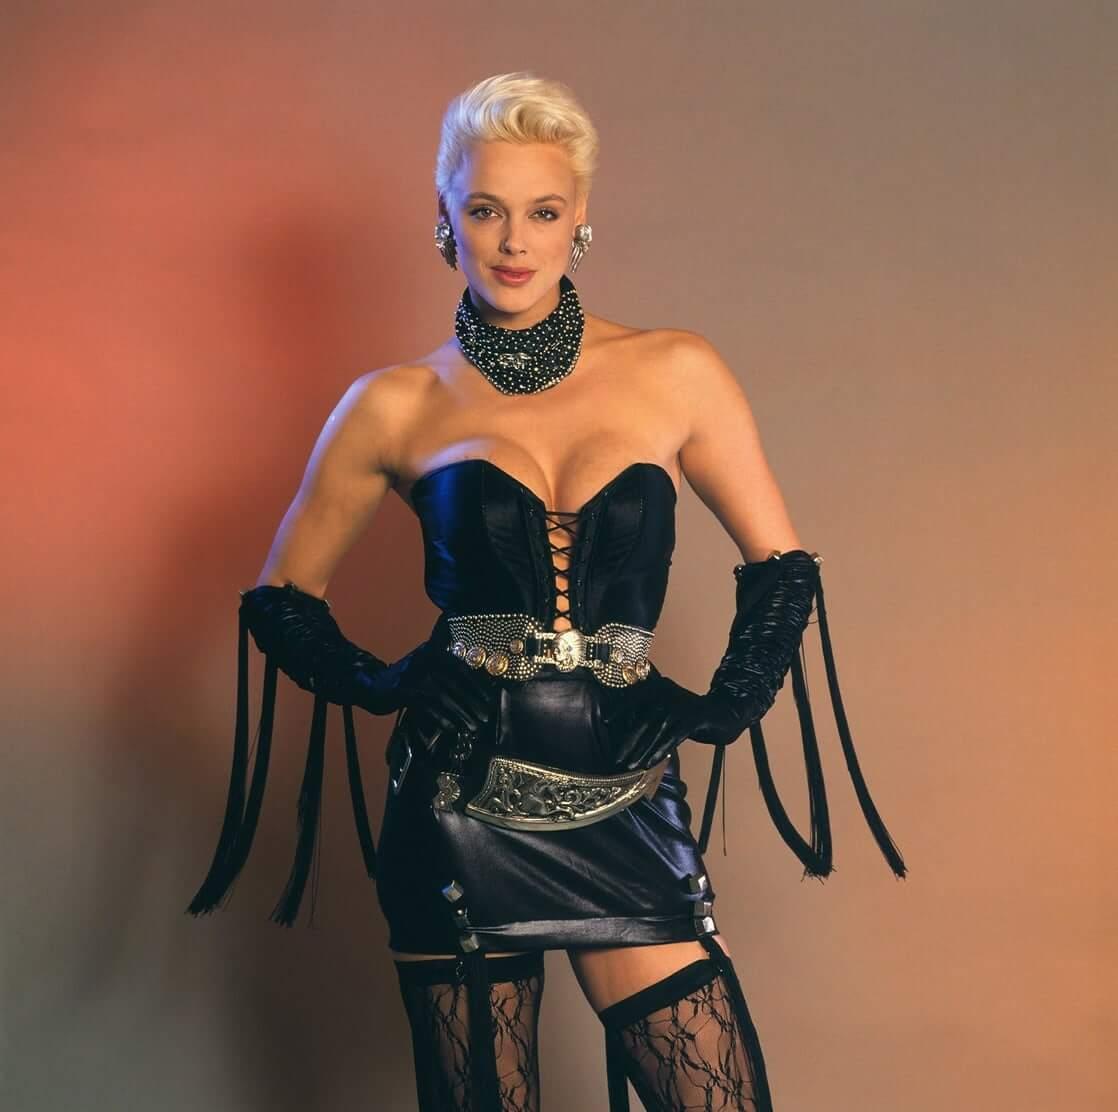 Brigitte Nielsen awesome pics